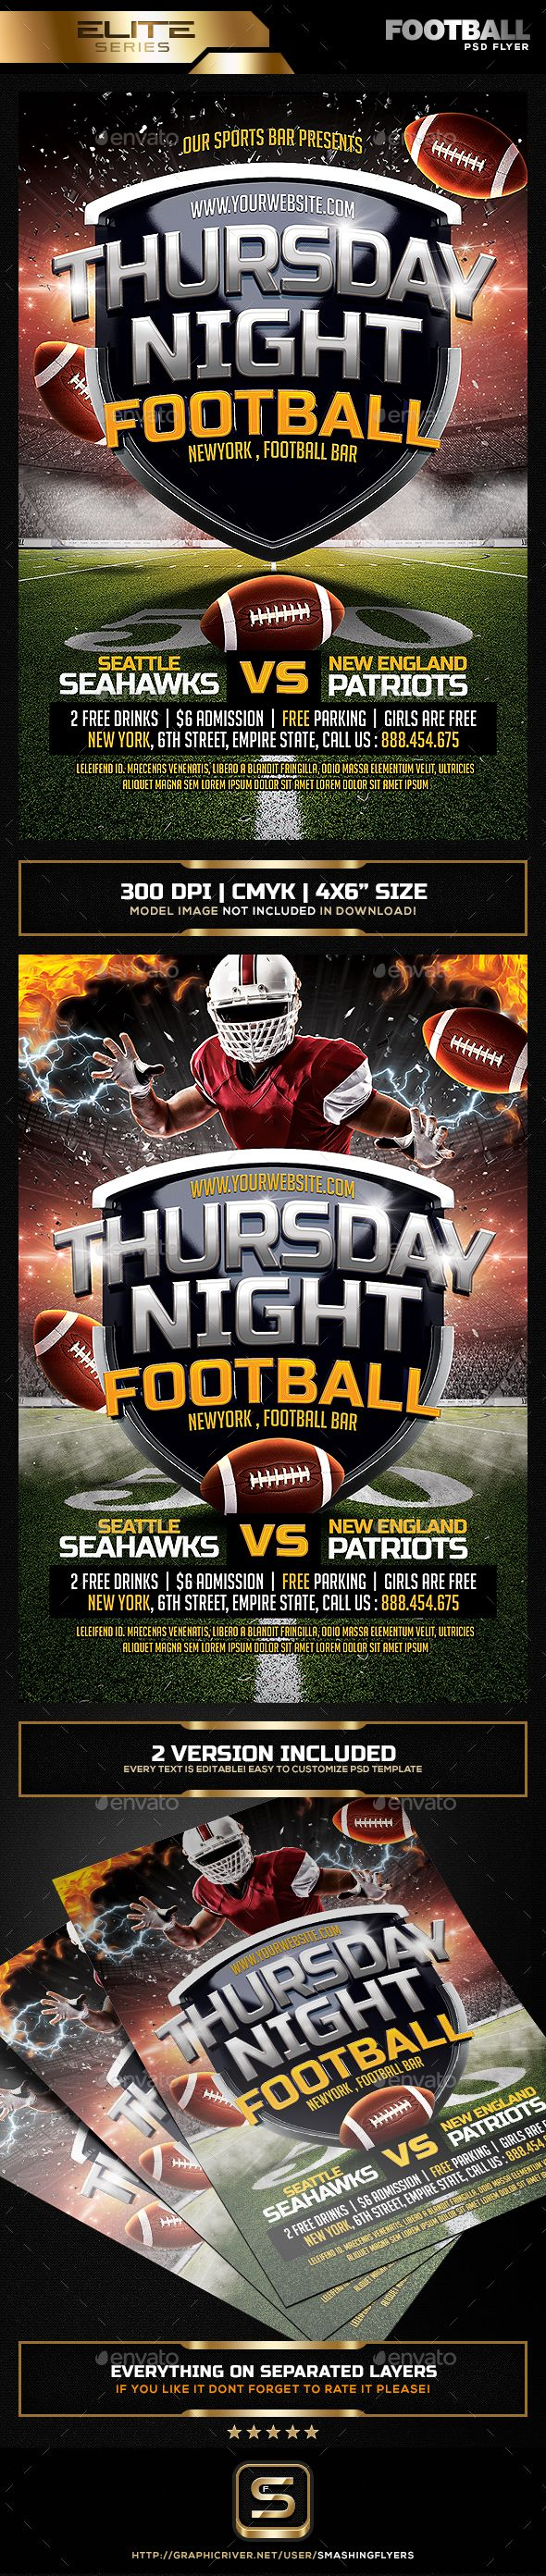 Thursday Night Football Flyer Template PSD. Download: http://graphicriver.net/item/thursday-night-football-flyer/14537353?ref=ksioks